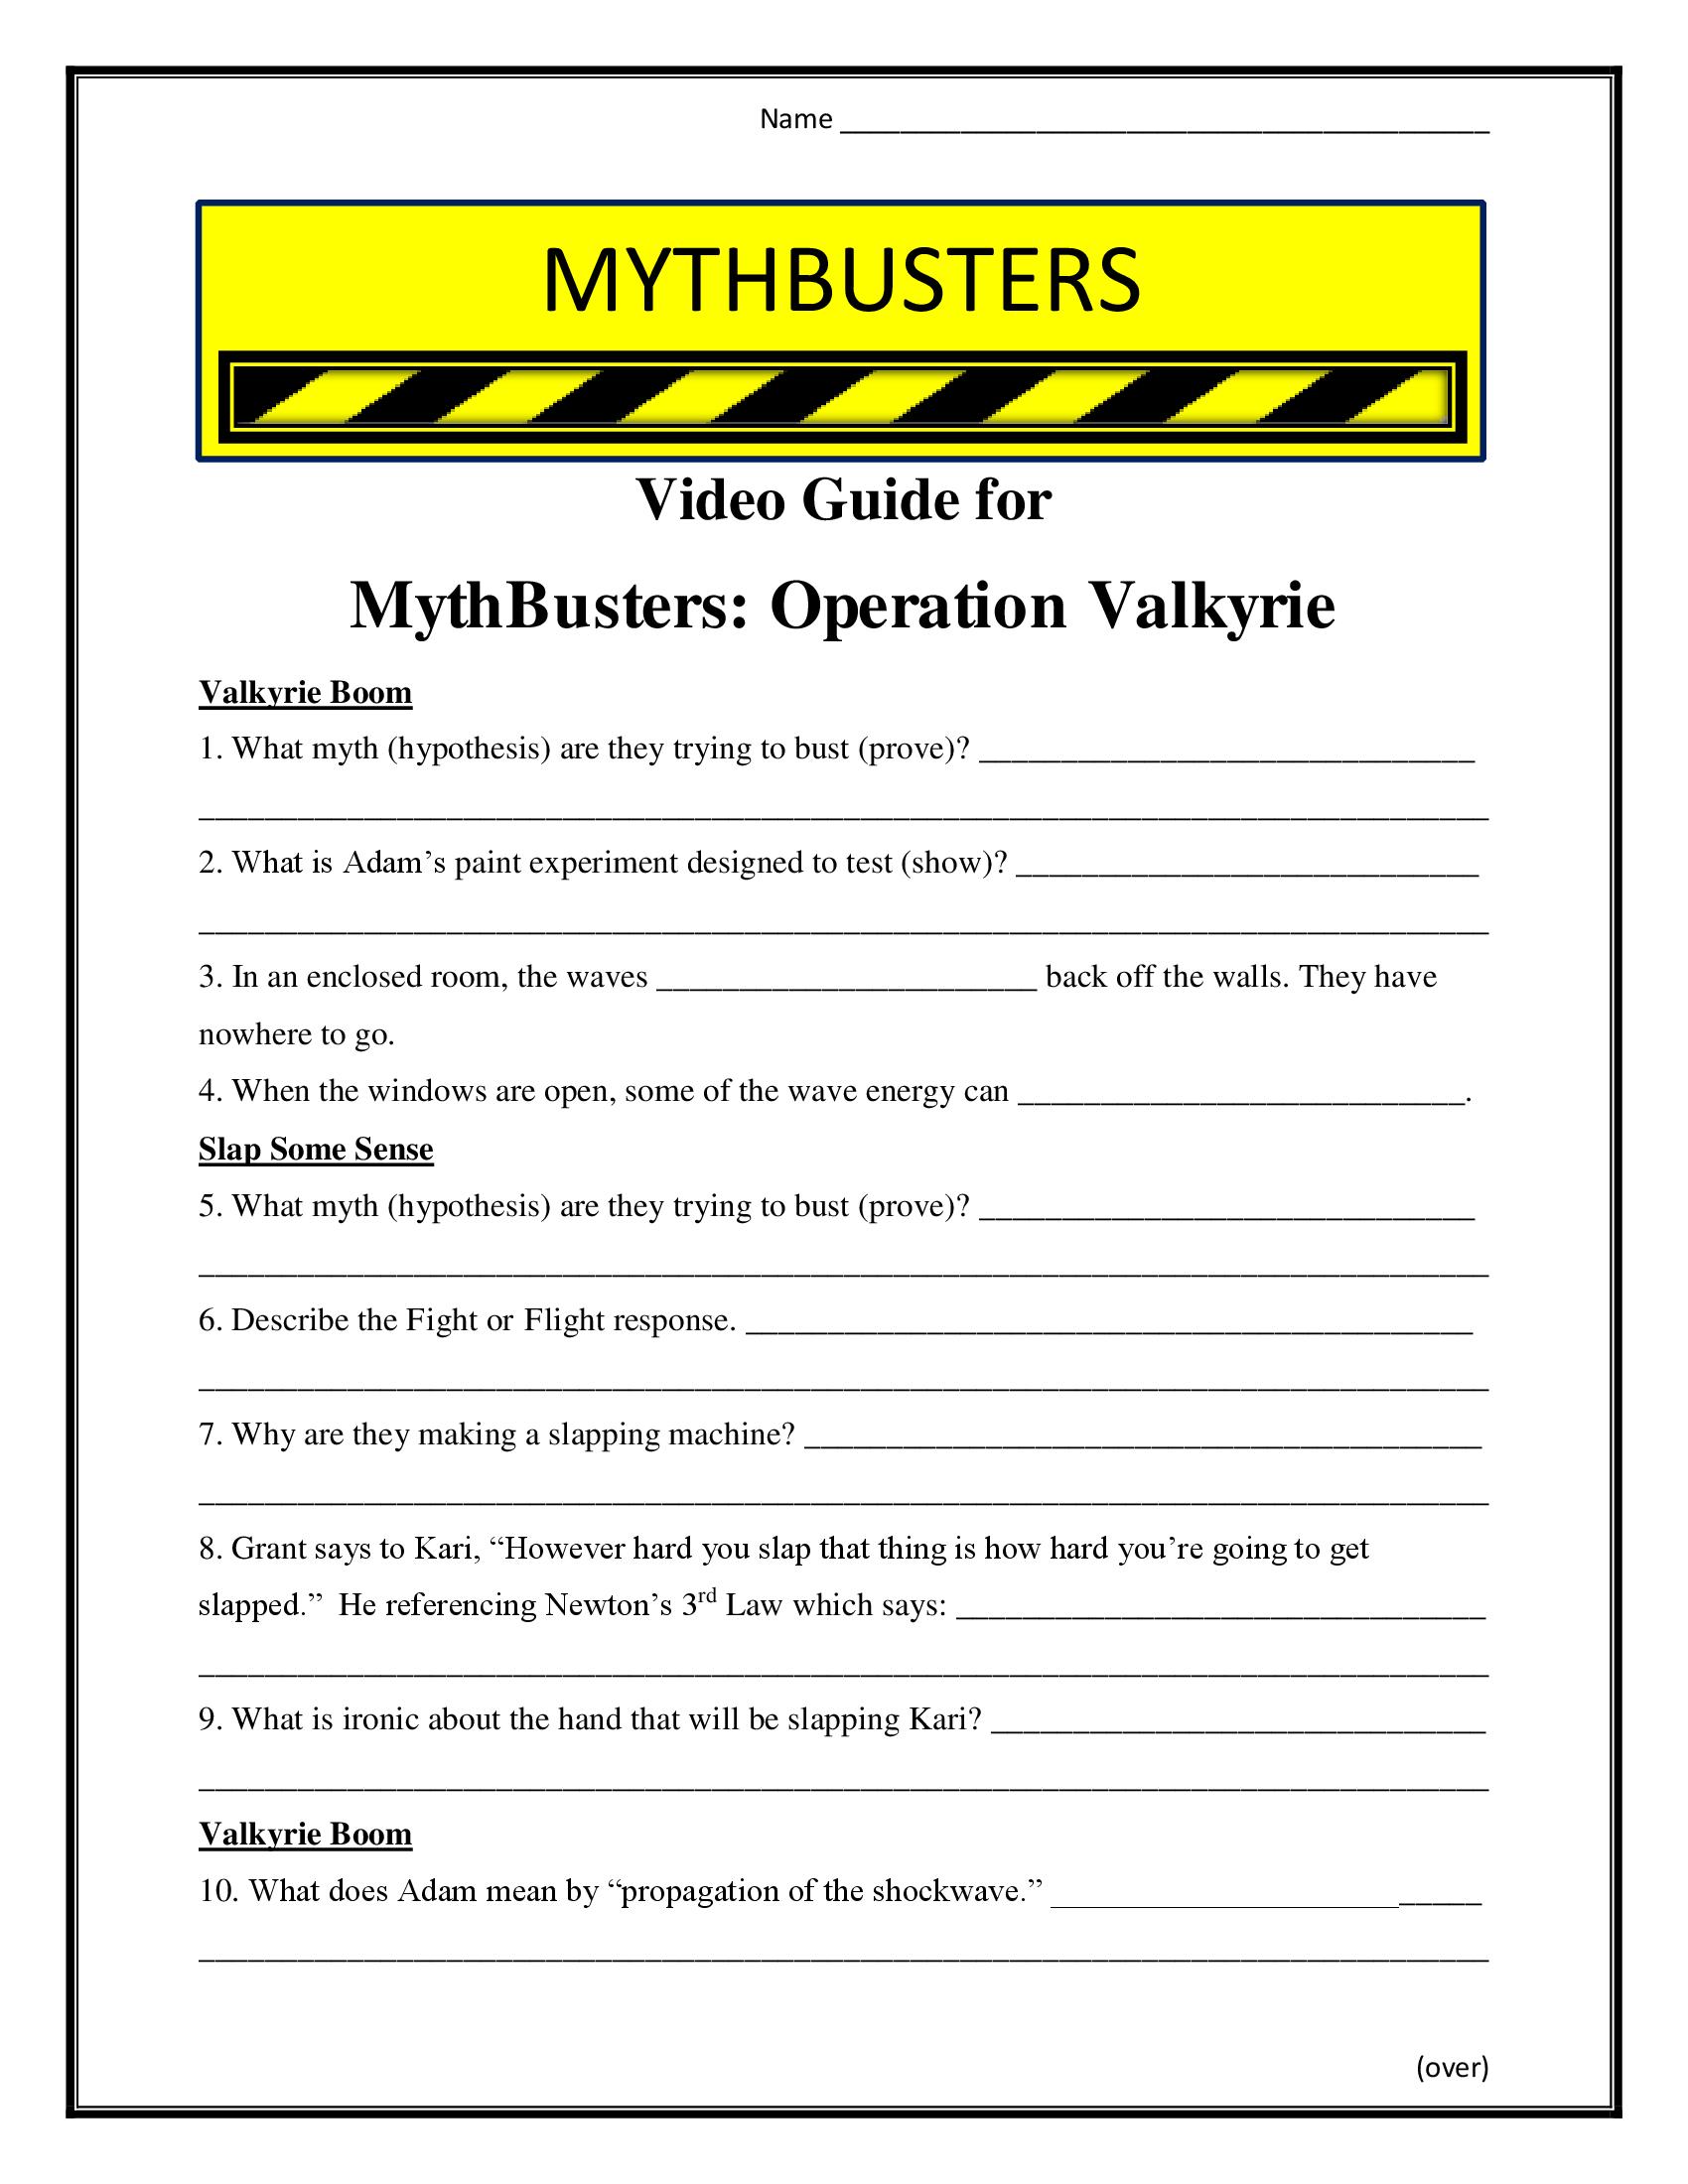 Mythbusters Operation Valkyrie Worksheet Season 7